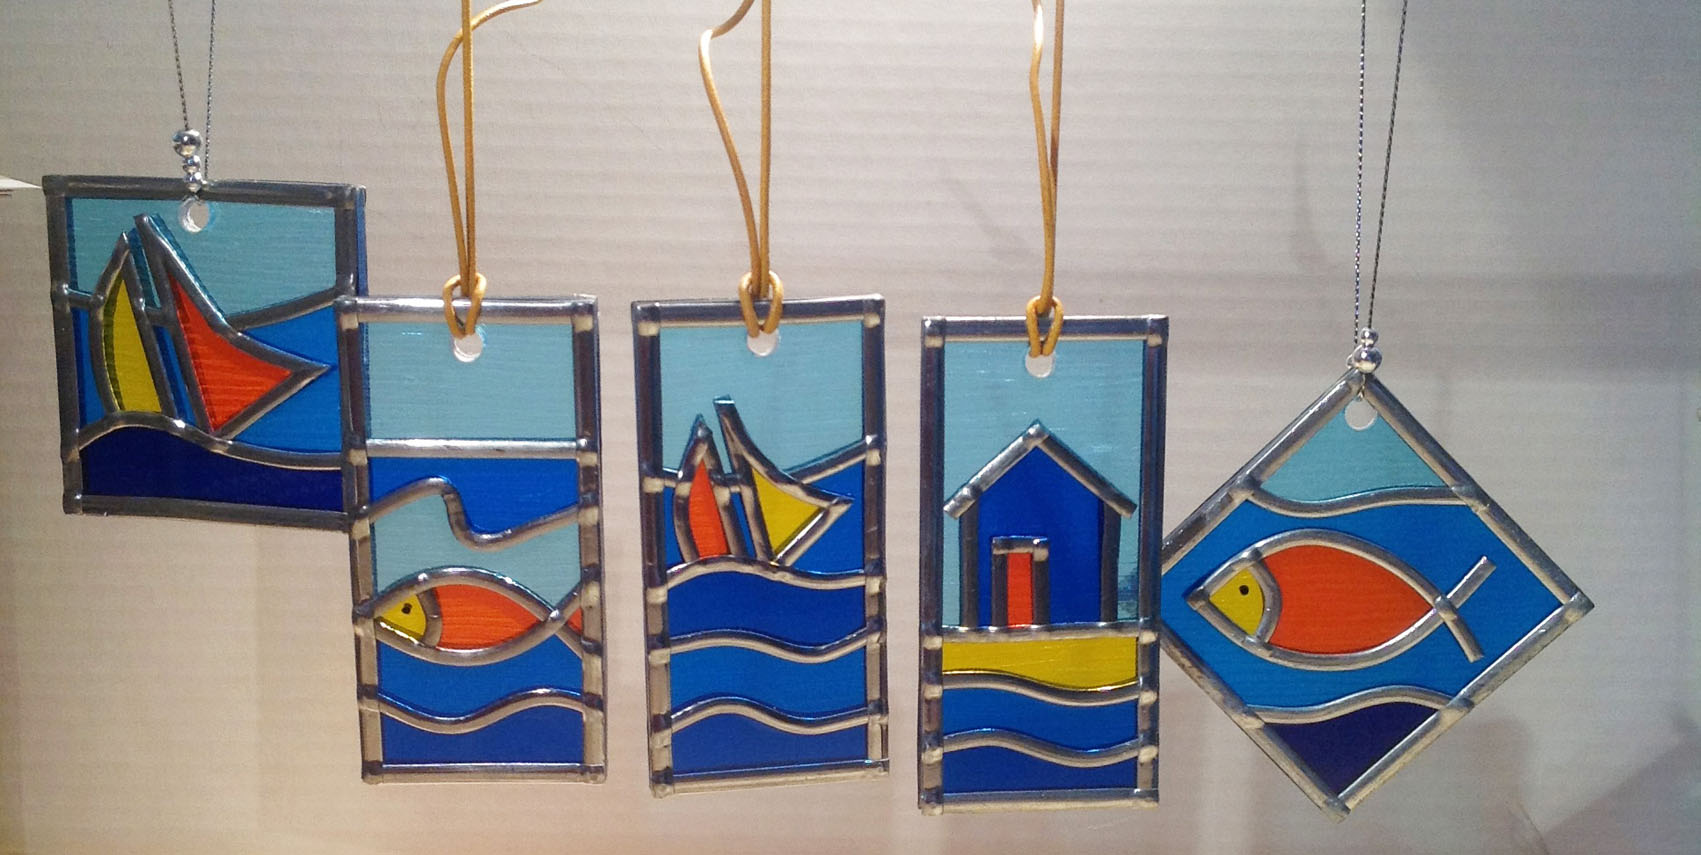 Seaside stained glass suncatcher